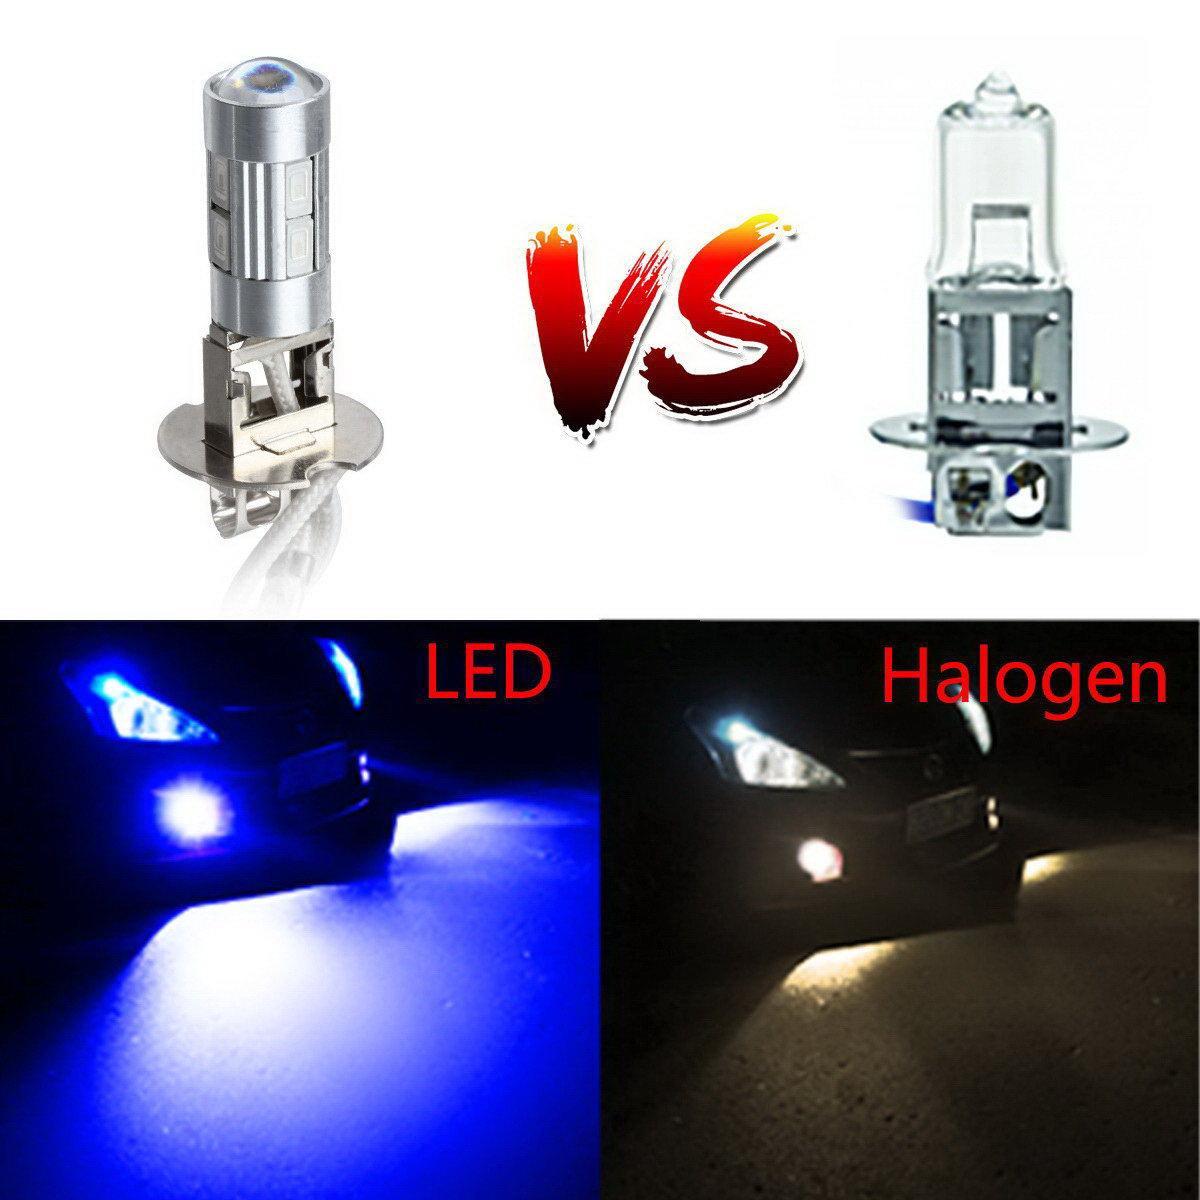 2x Ultra Bright Blue H3 52130 High Power 10 5730 SMD LED Bulb Fog Running Light